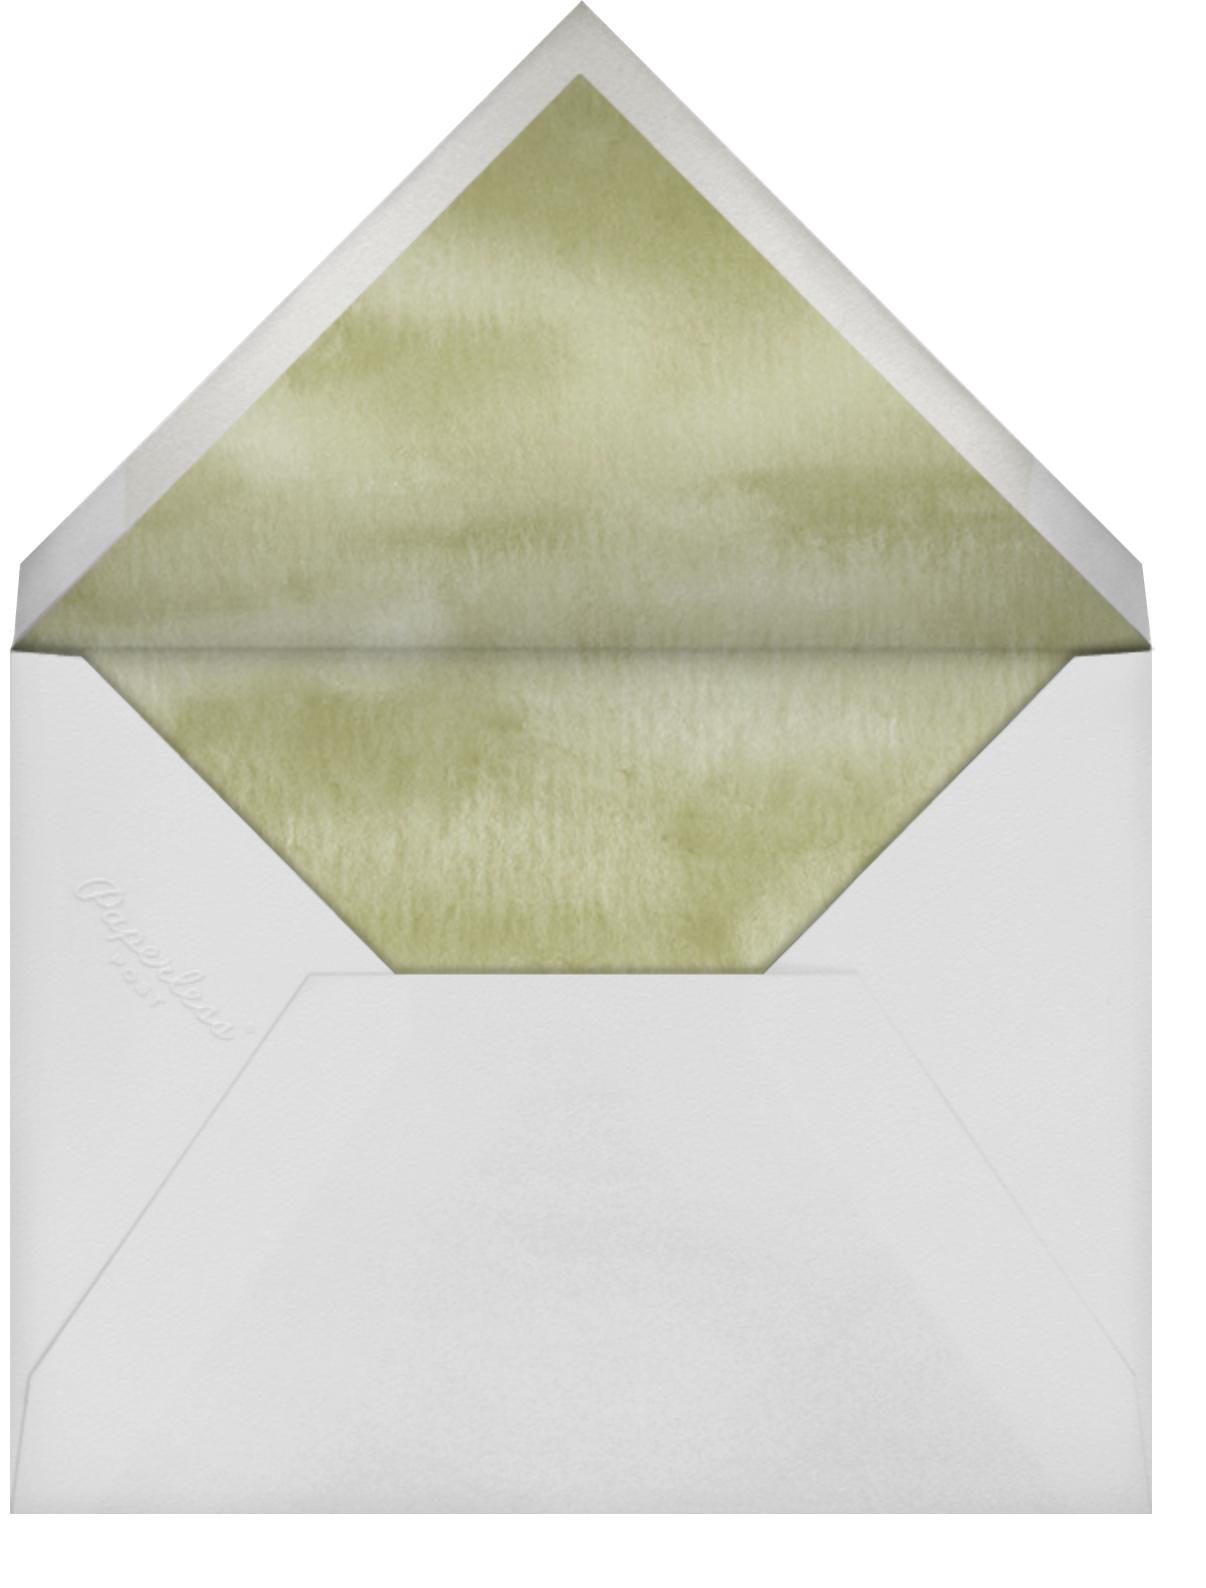 Falling Foliage - Felix Doolittle - Envelope